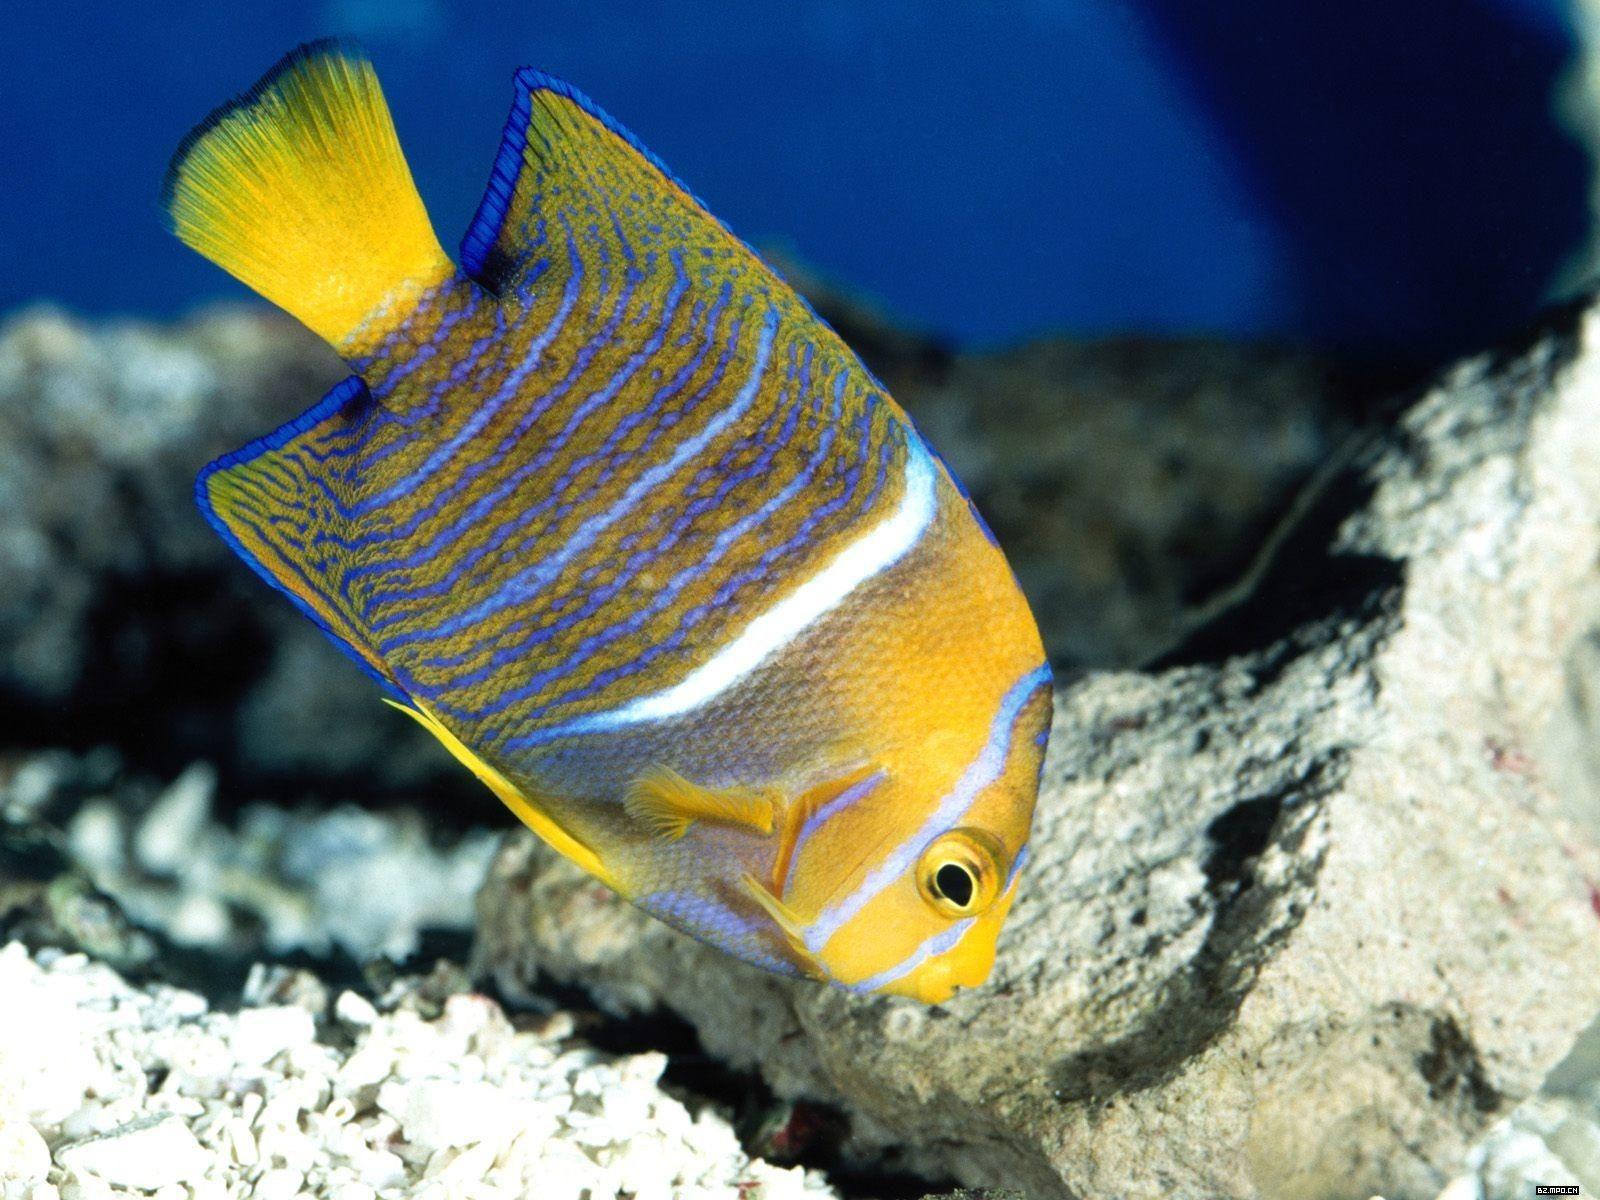 Colorful Tropical Fish Wallpaper Albums 4 1600x1200